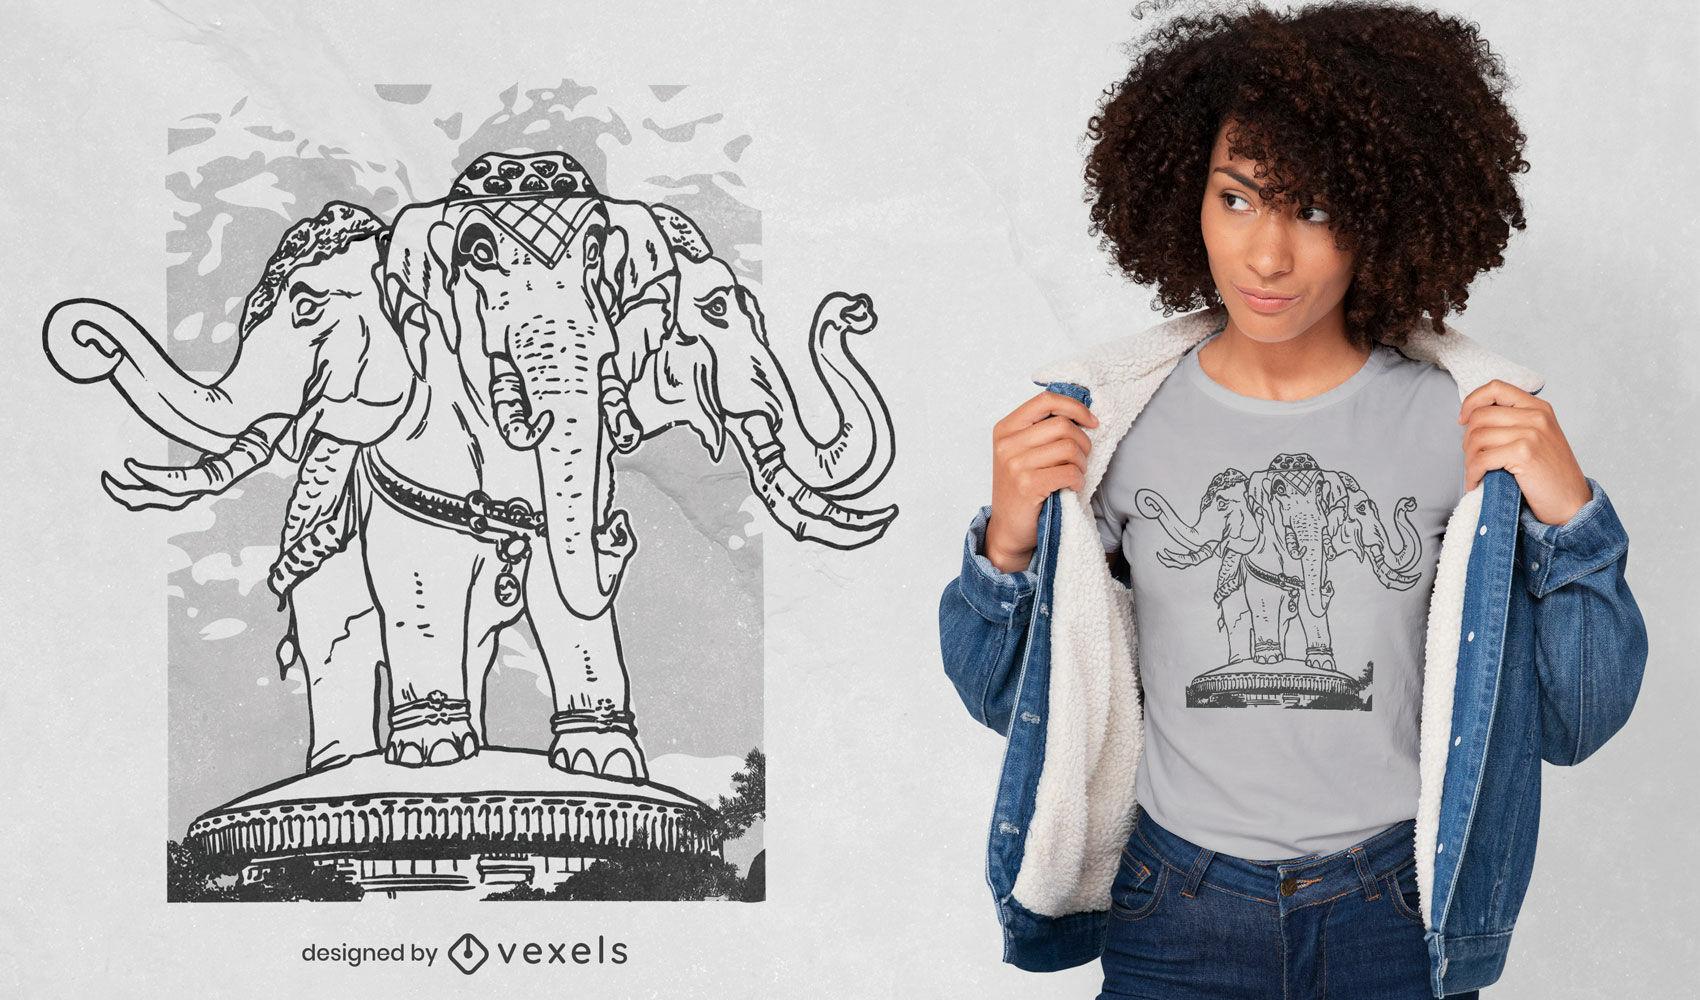 Three-headed elephant t-shirt design